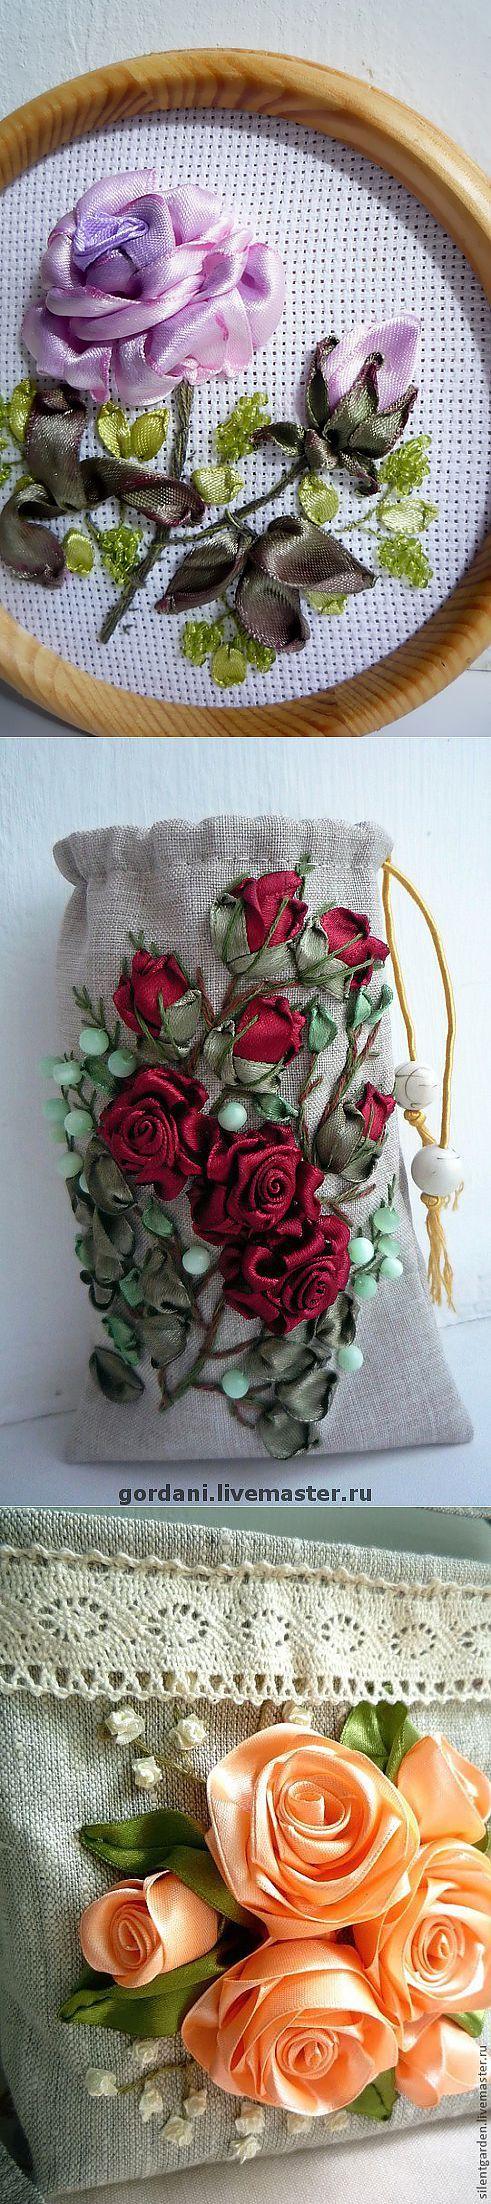 Объемная вышивка из ленты